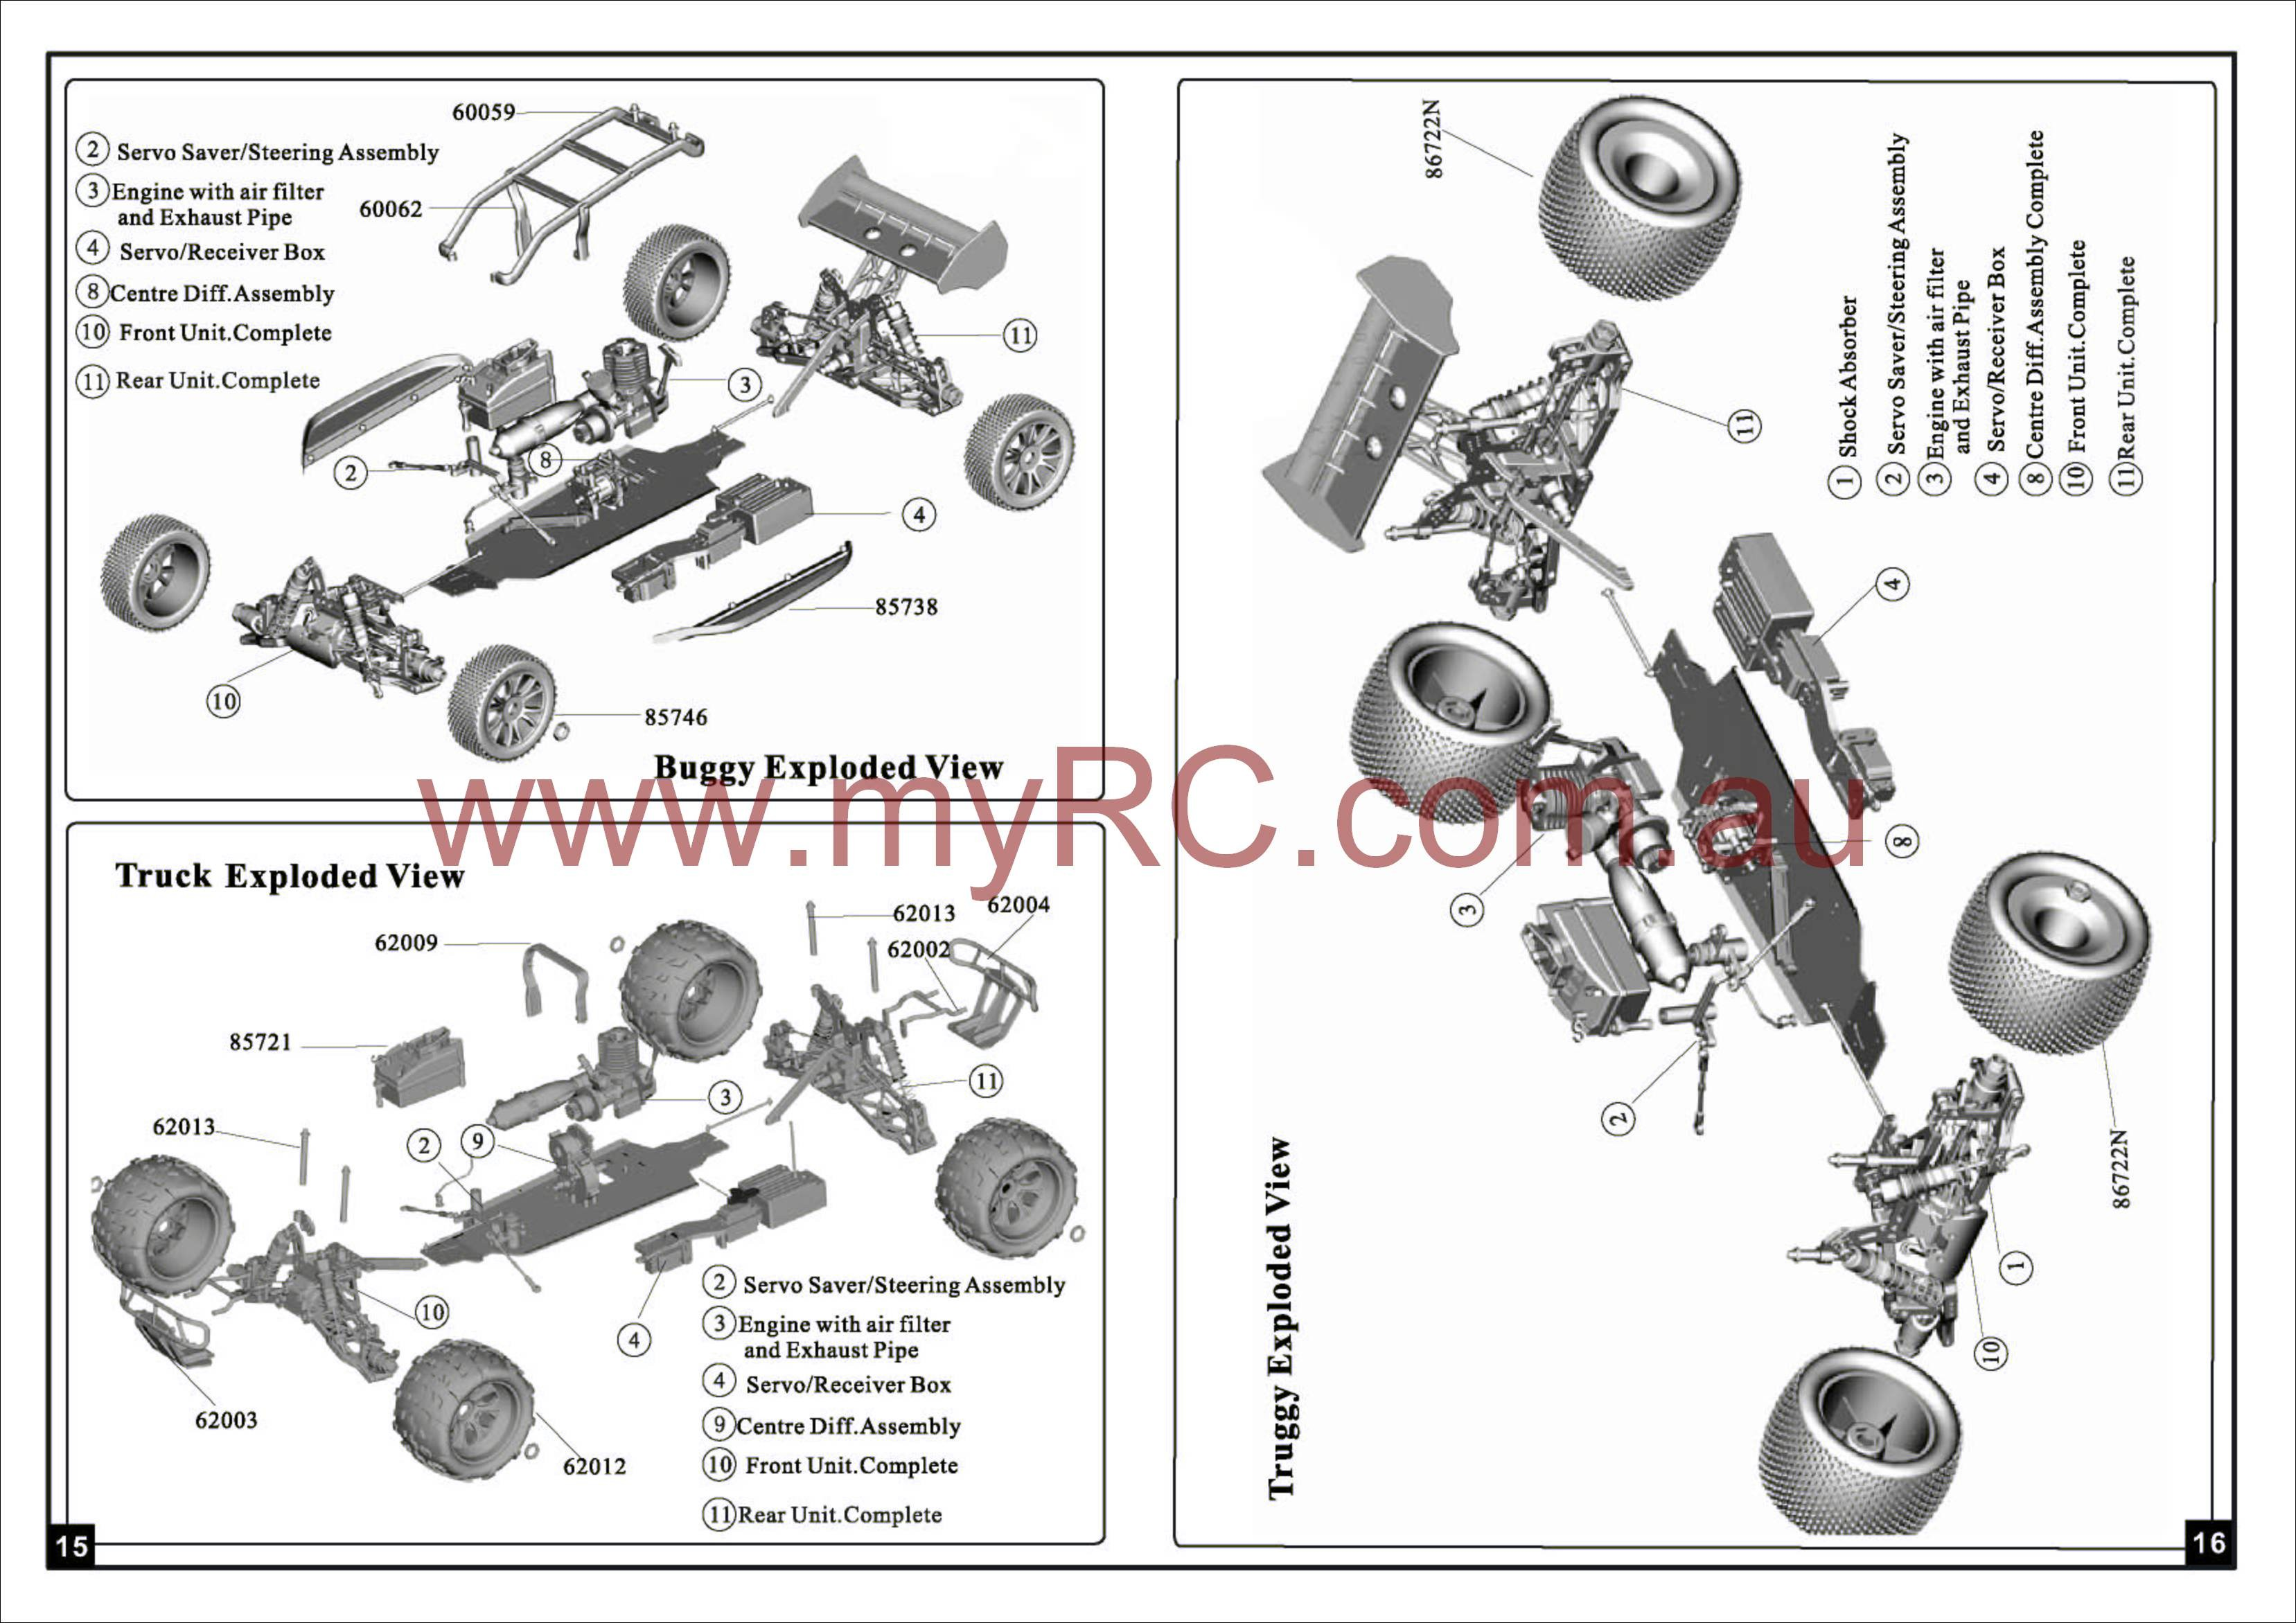 Car Parts List Diagram Hsp 1 8n Road Car User Manual Free Download Myrc Of Car Parts List Diagram